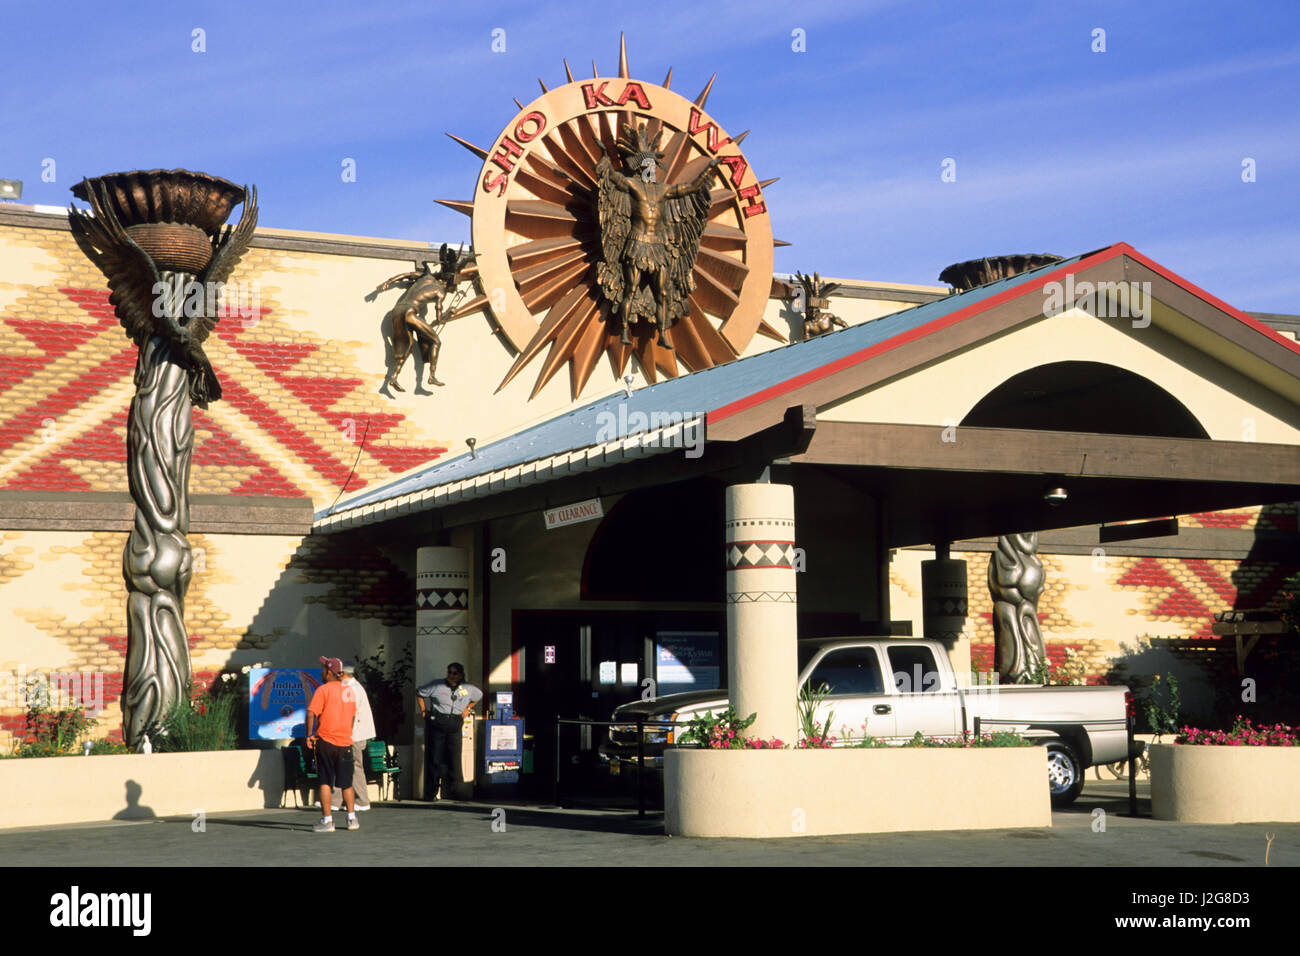 Hopland band of pomo new casino casino rocky mount north carolina